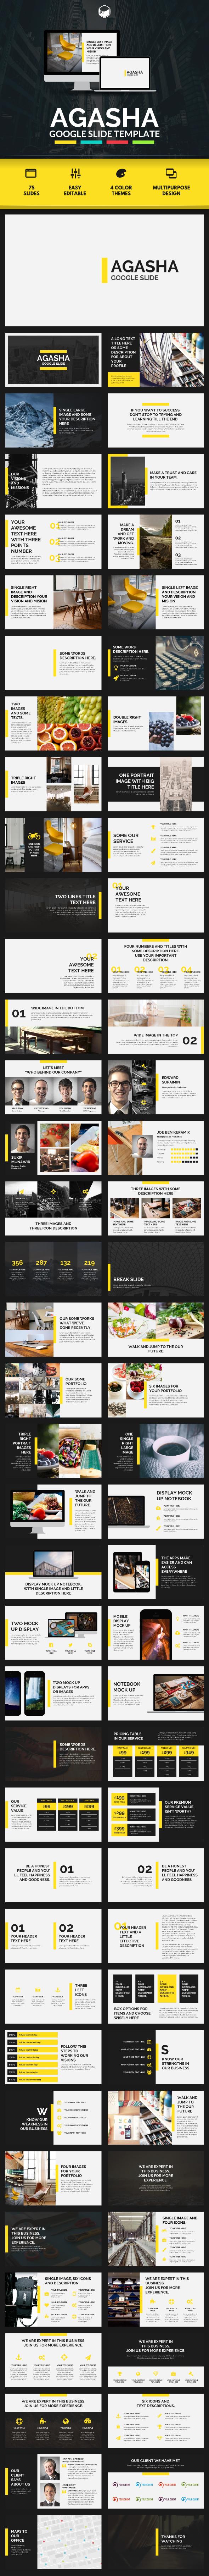 AGASHA - Google Slide Template by descarteshouston | GraphicRiver